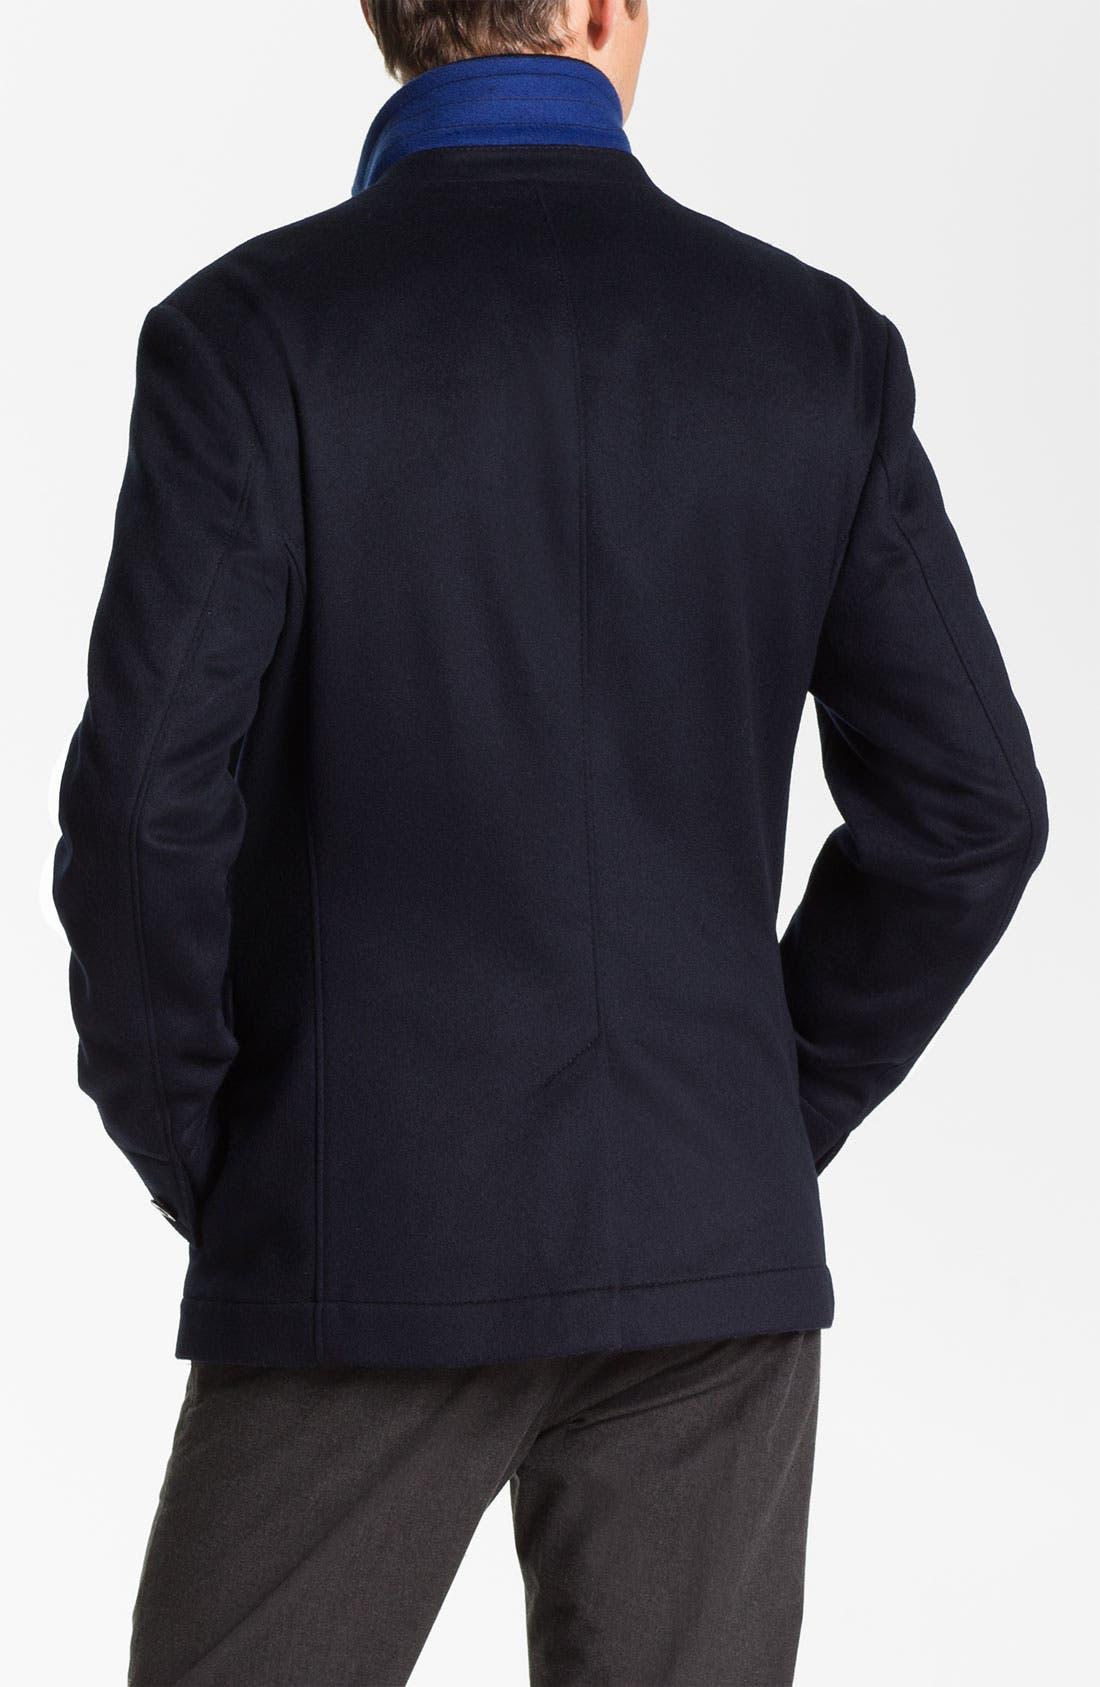 Alternate Image 2  - BOSS Black 'Clynt' Wool & Cashmere Blend Jacket